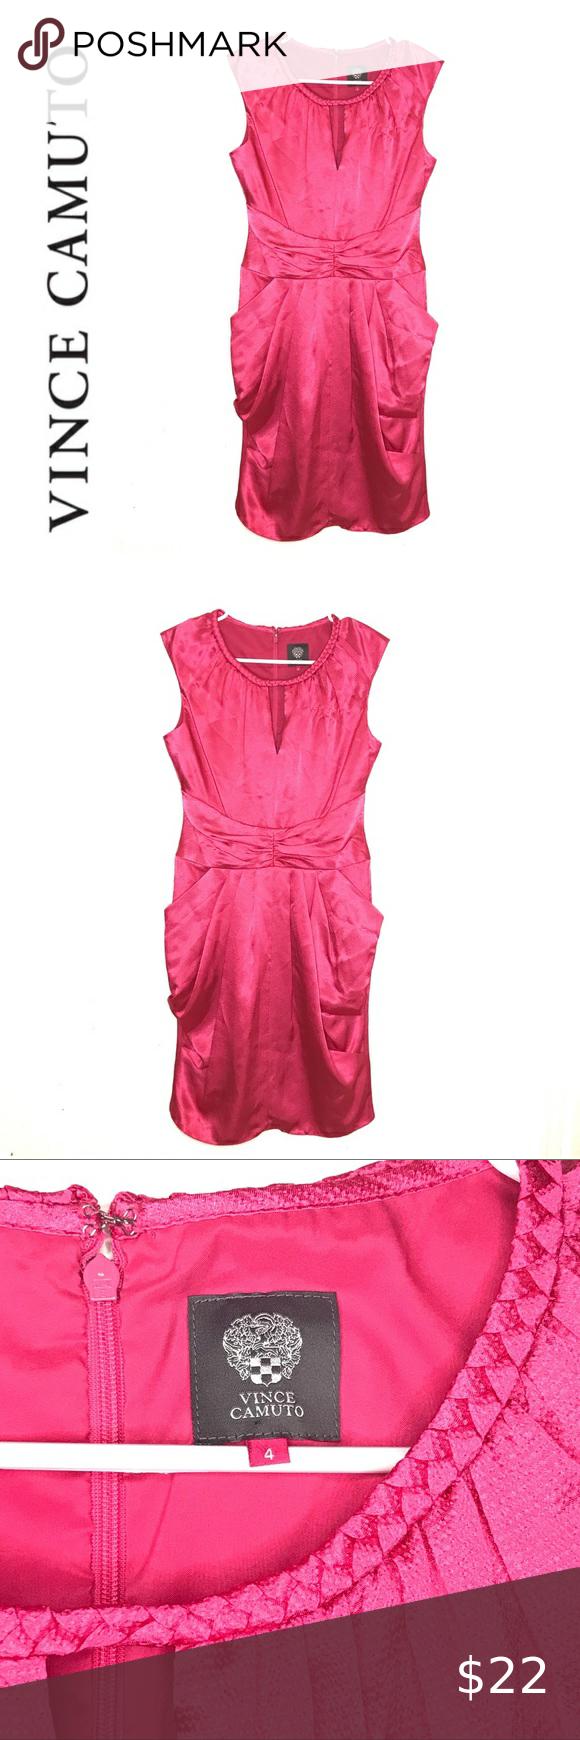 Vince Camuto Pink Satin Shift Dress Vince Camuto Size 4 Pink Satin Shift Dress Sleeveless With Notched V Neck Pockets Shift Dress Pink Satin Vince Camuto Dress [ 1740 x 580 Pixel ]